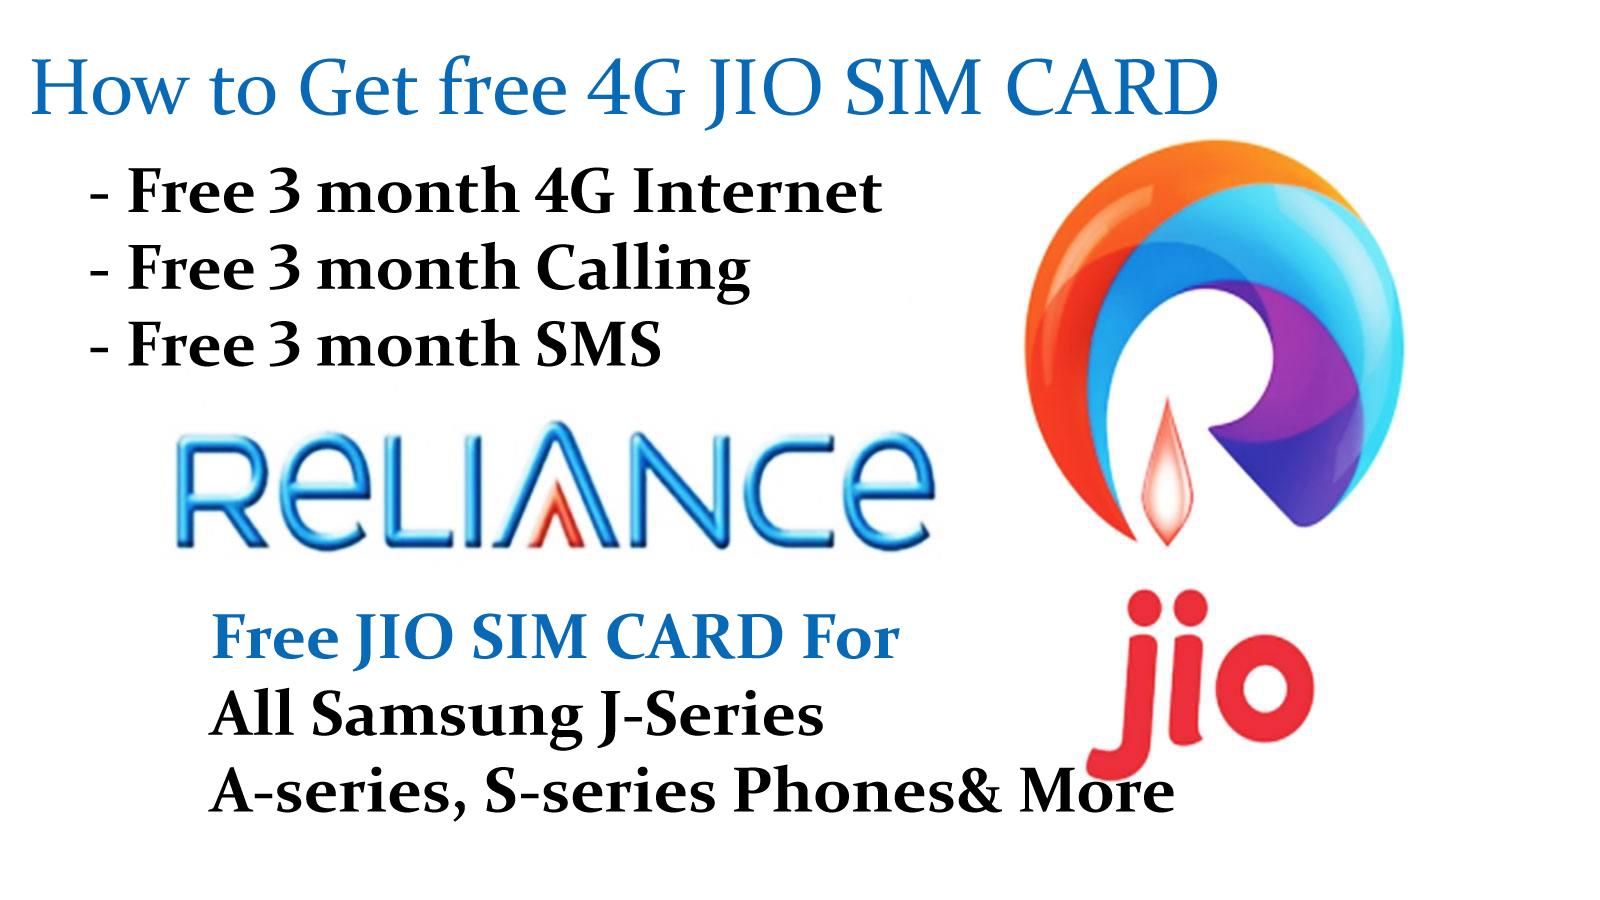 How to get Free Jio SIM for Samsung galaxy j2,j5,j7 & all 2016 Edition Phones